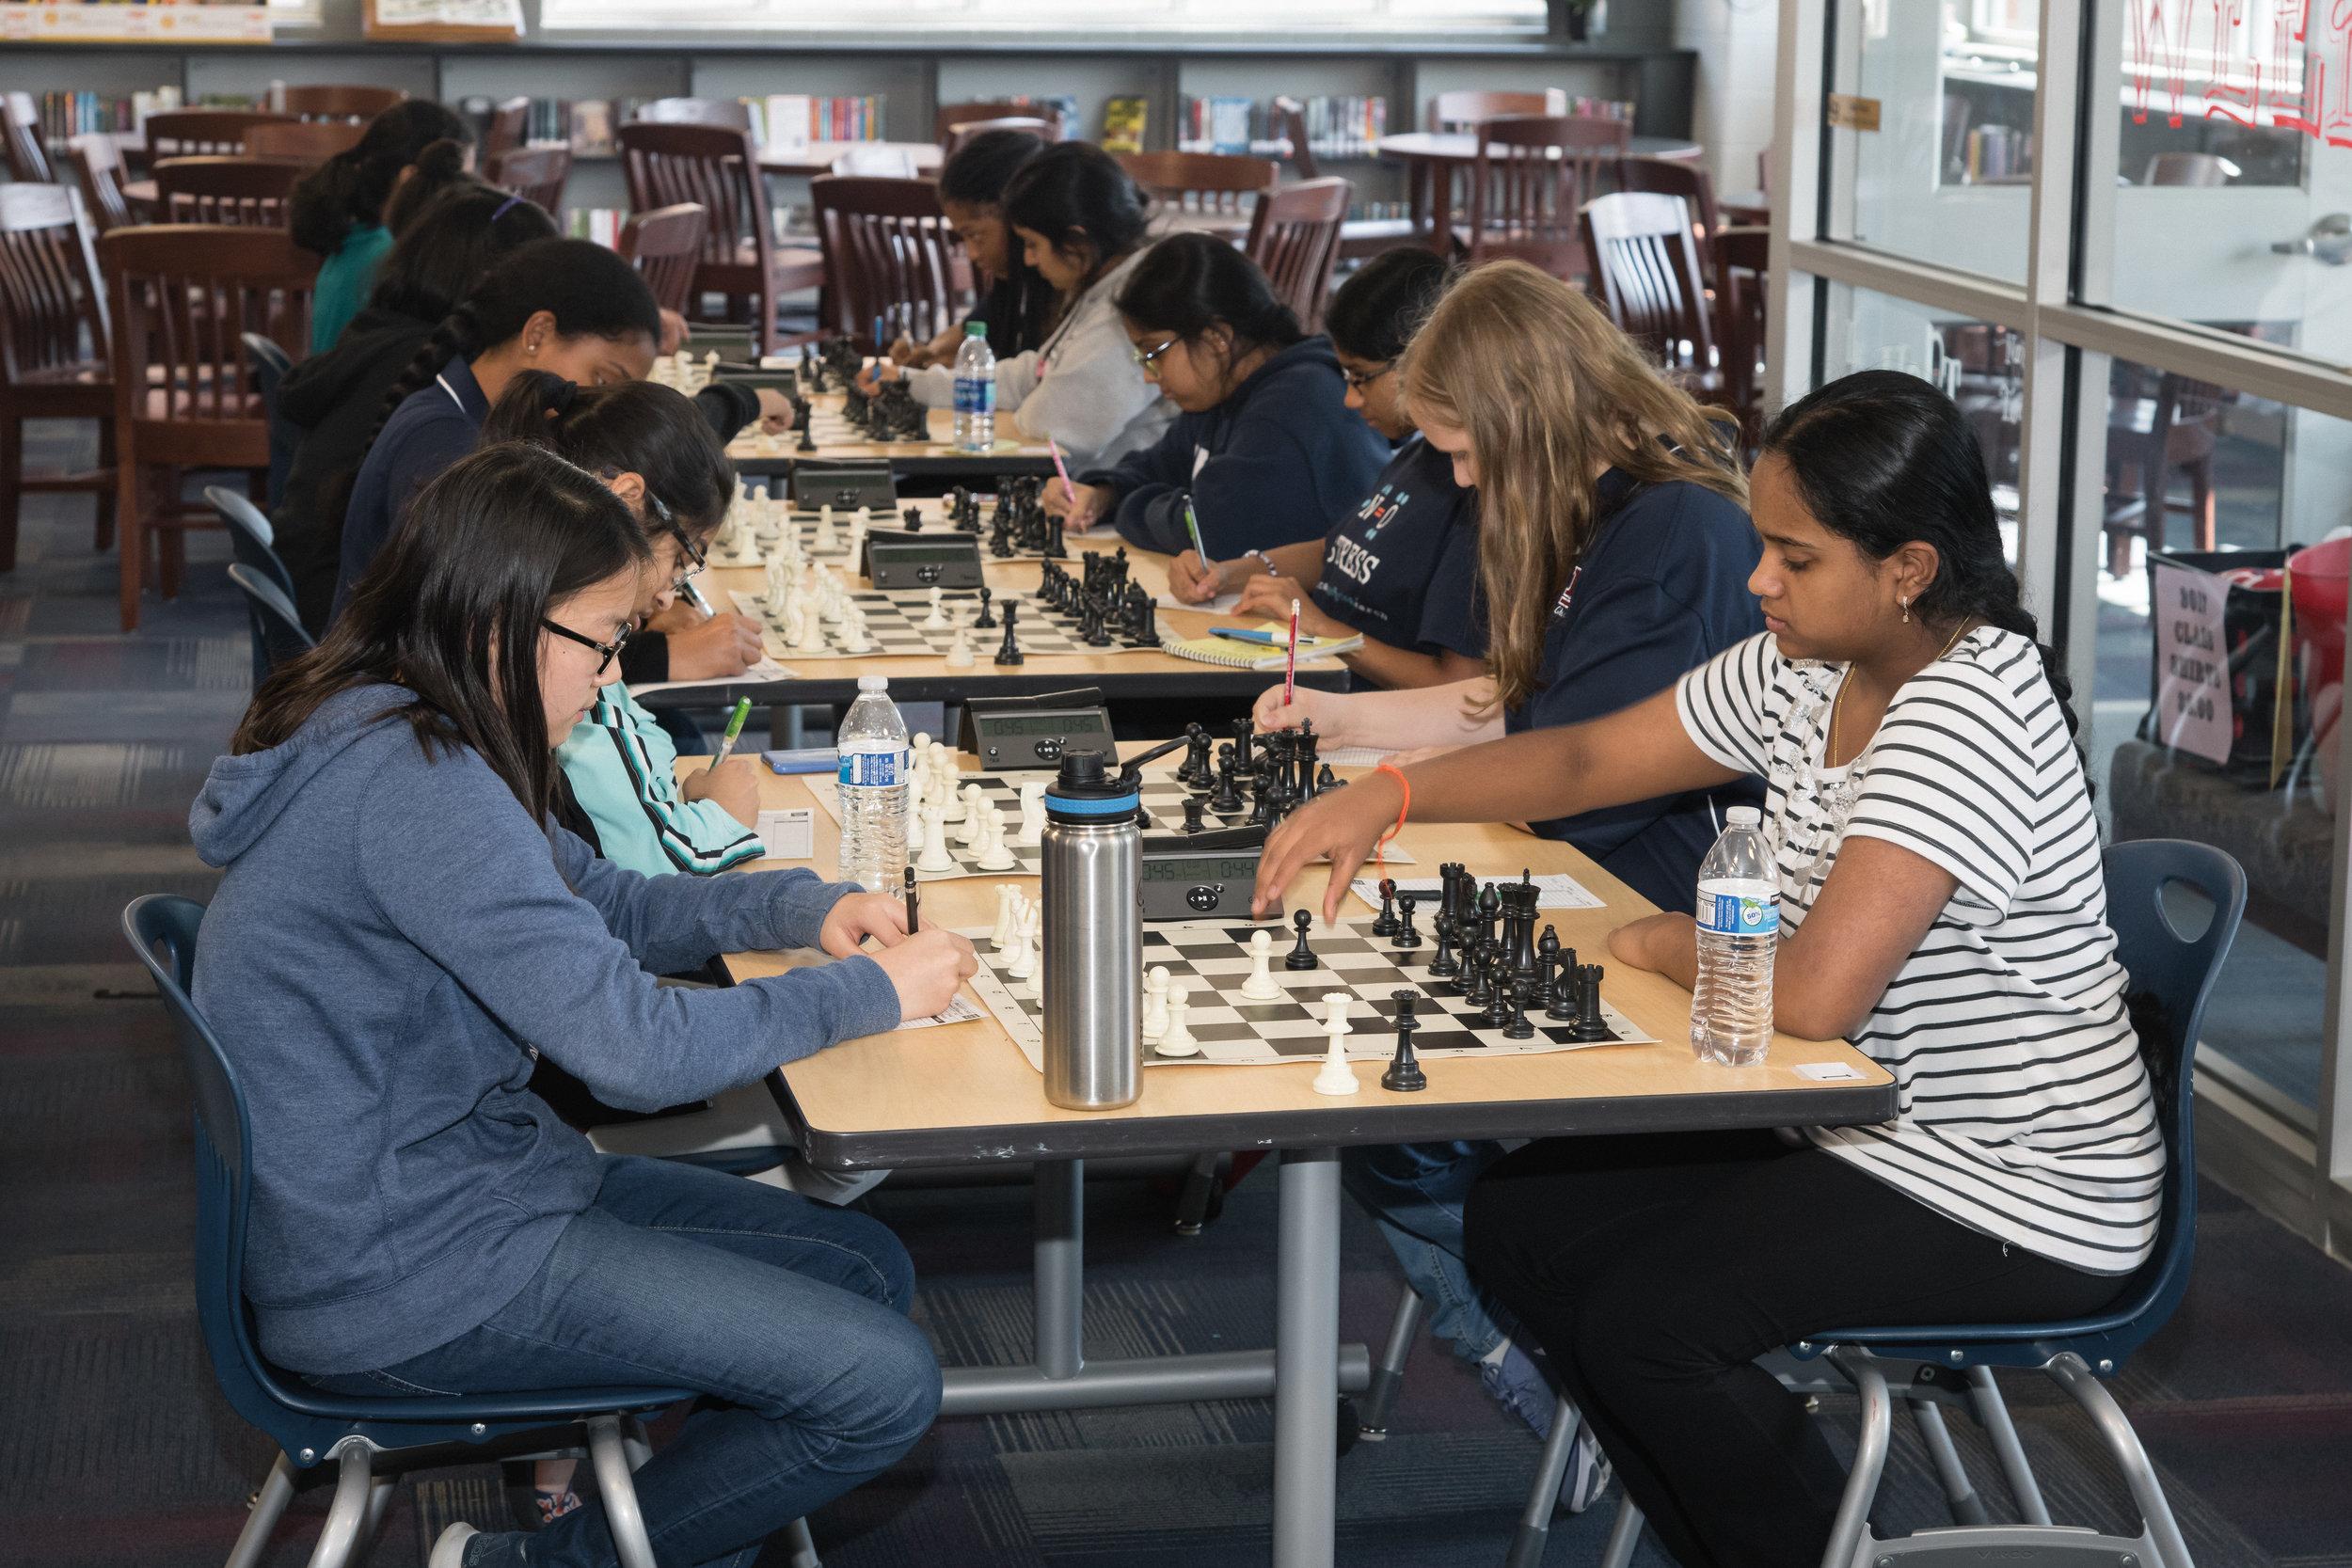 The critical game between Constance (left) and Sarvagna is underway!Photo: Scott Wilhelm